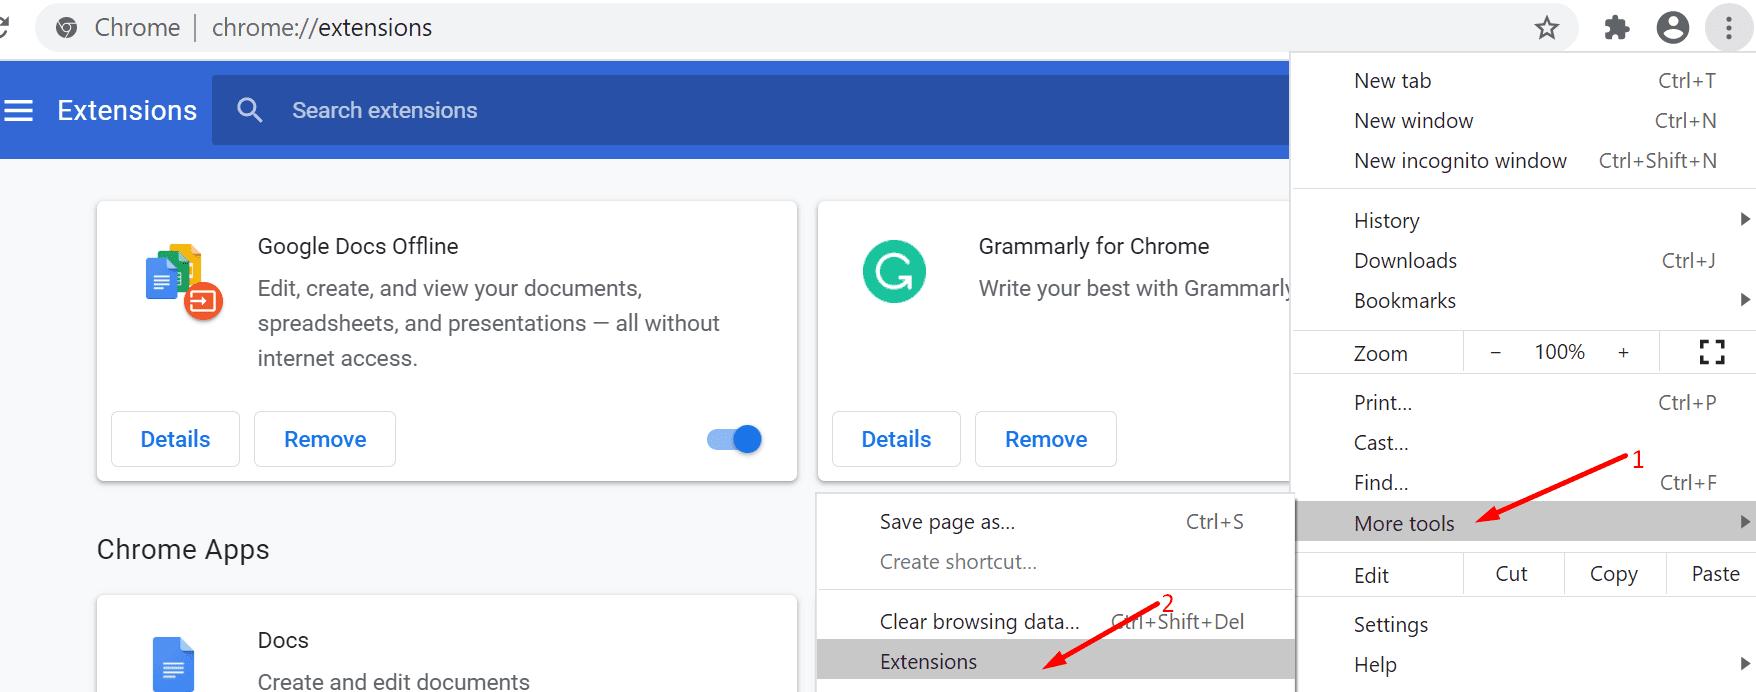 Kemudian-klik-Extensions